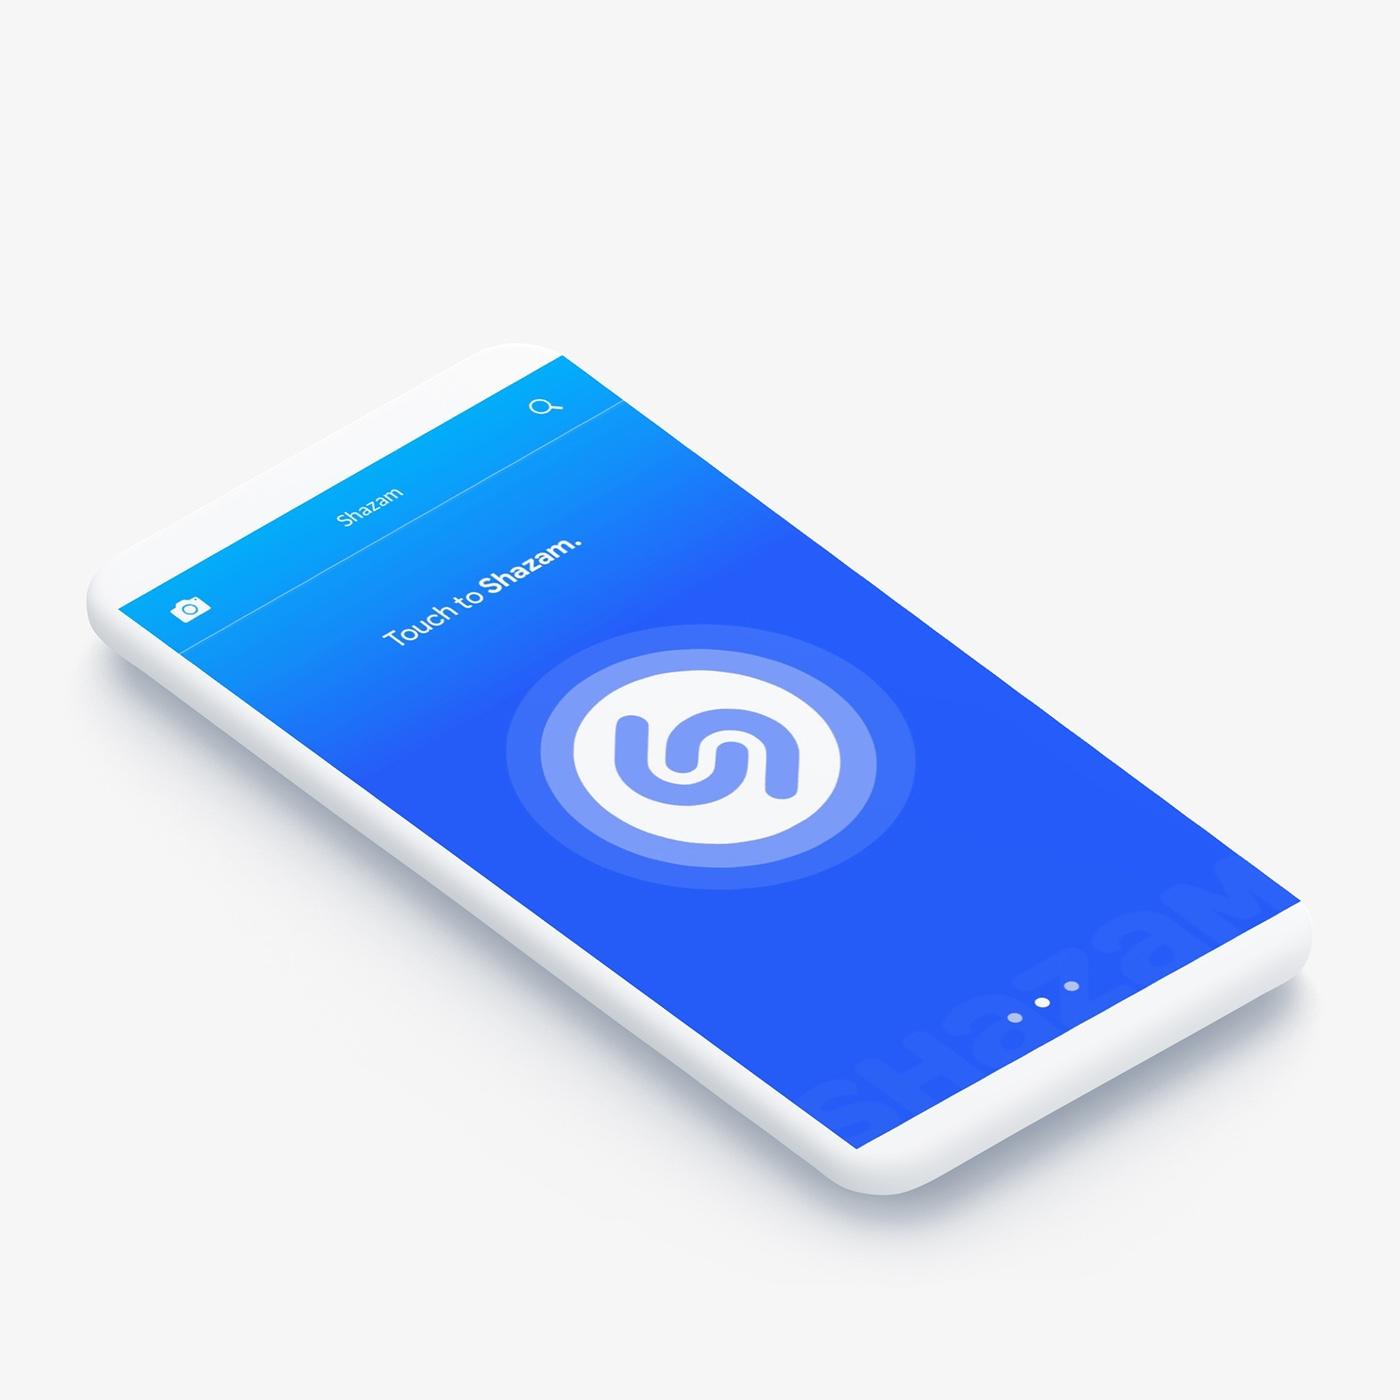 redesign concept app design Shazam app UI ux material android application